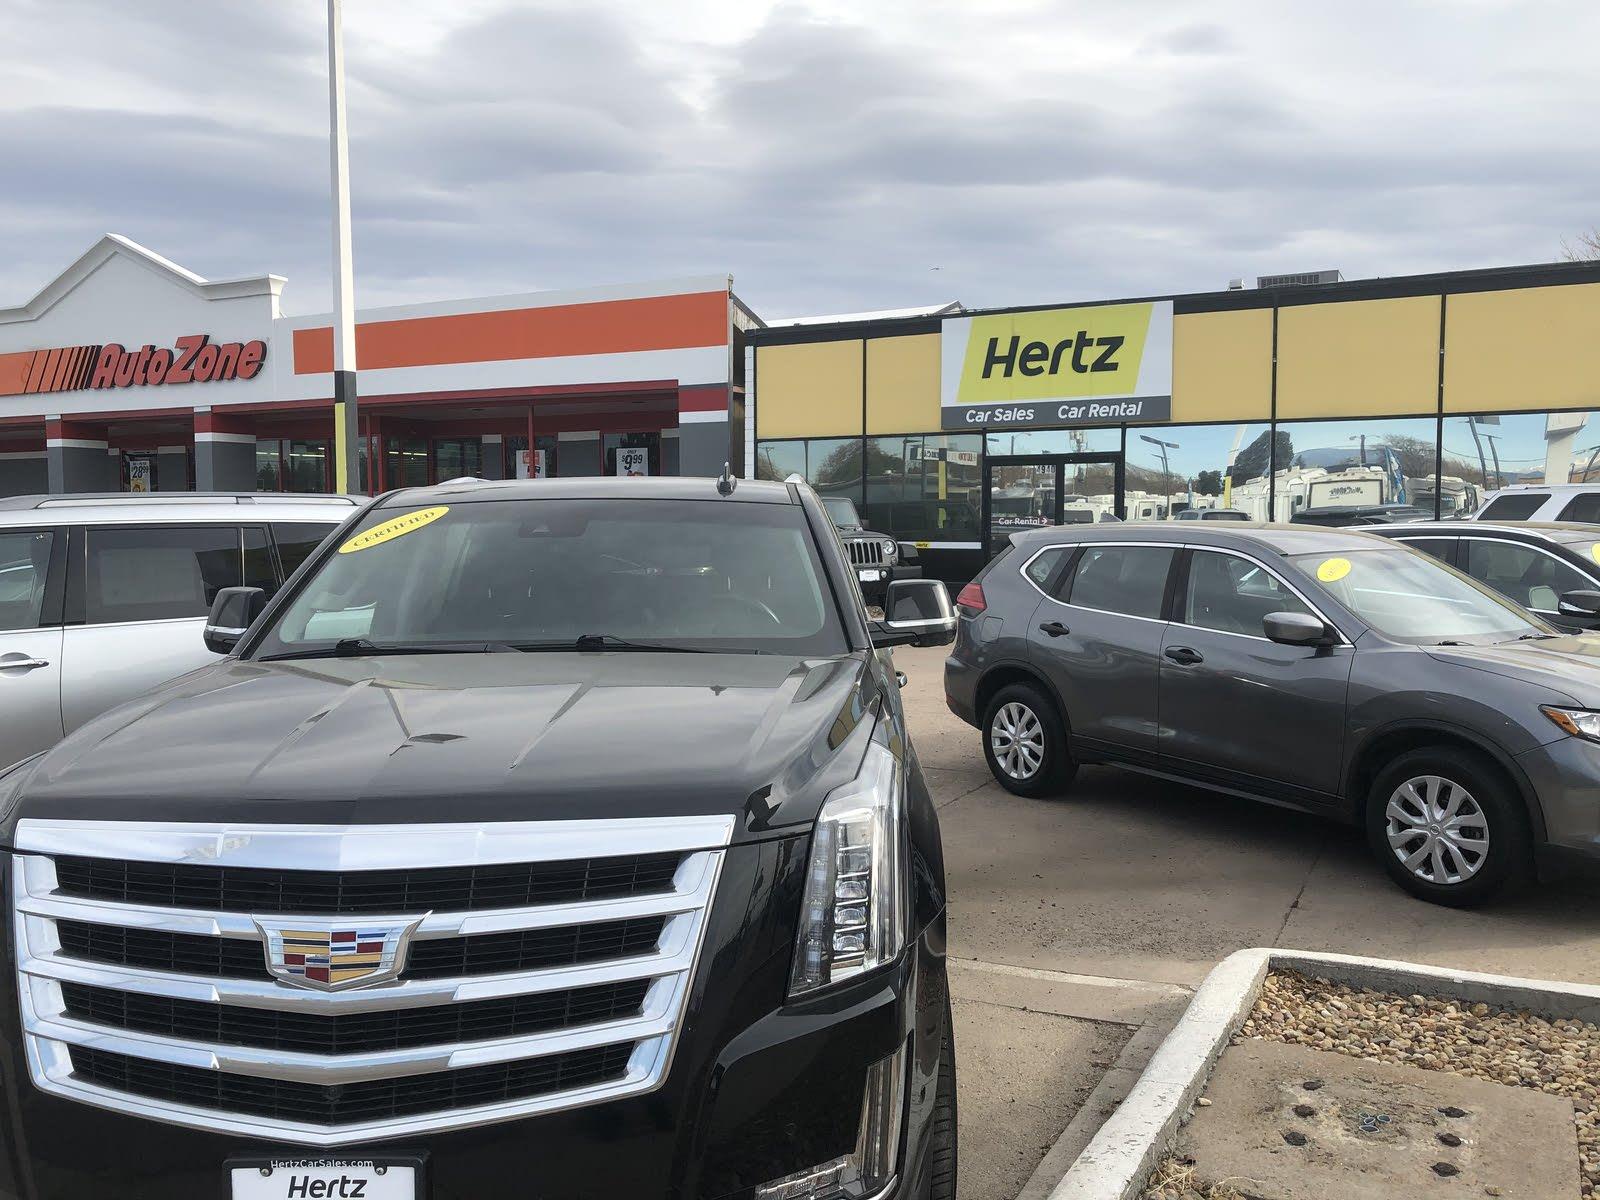 Hertz car sales denver